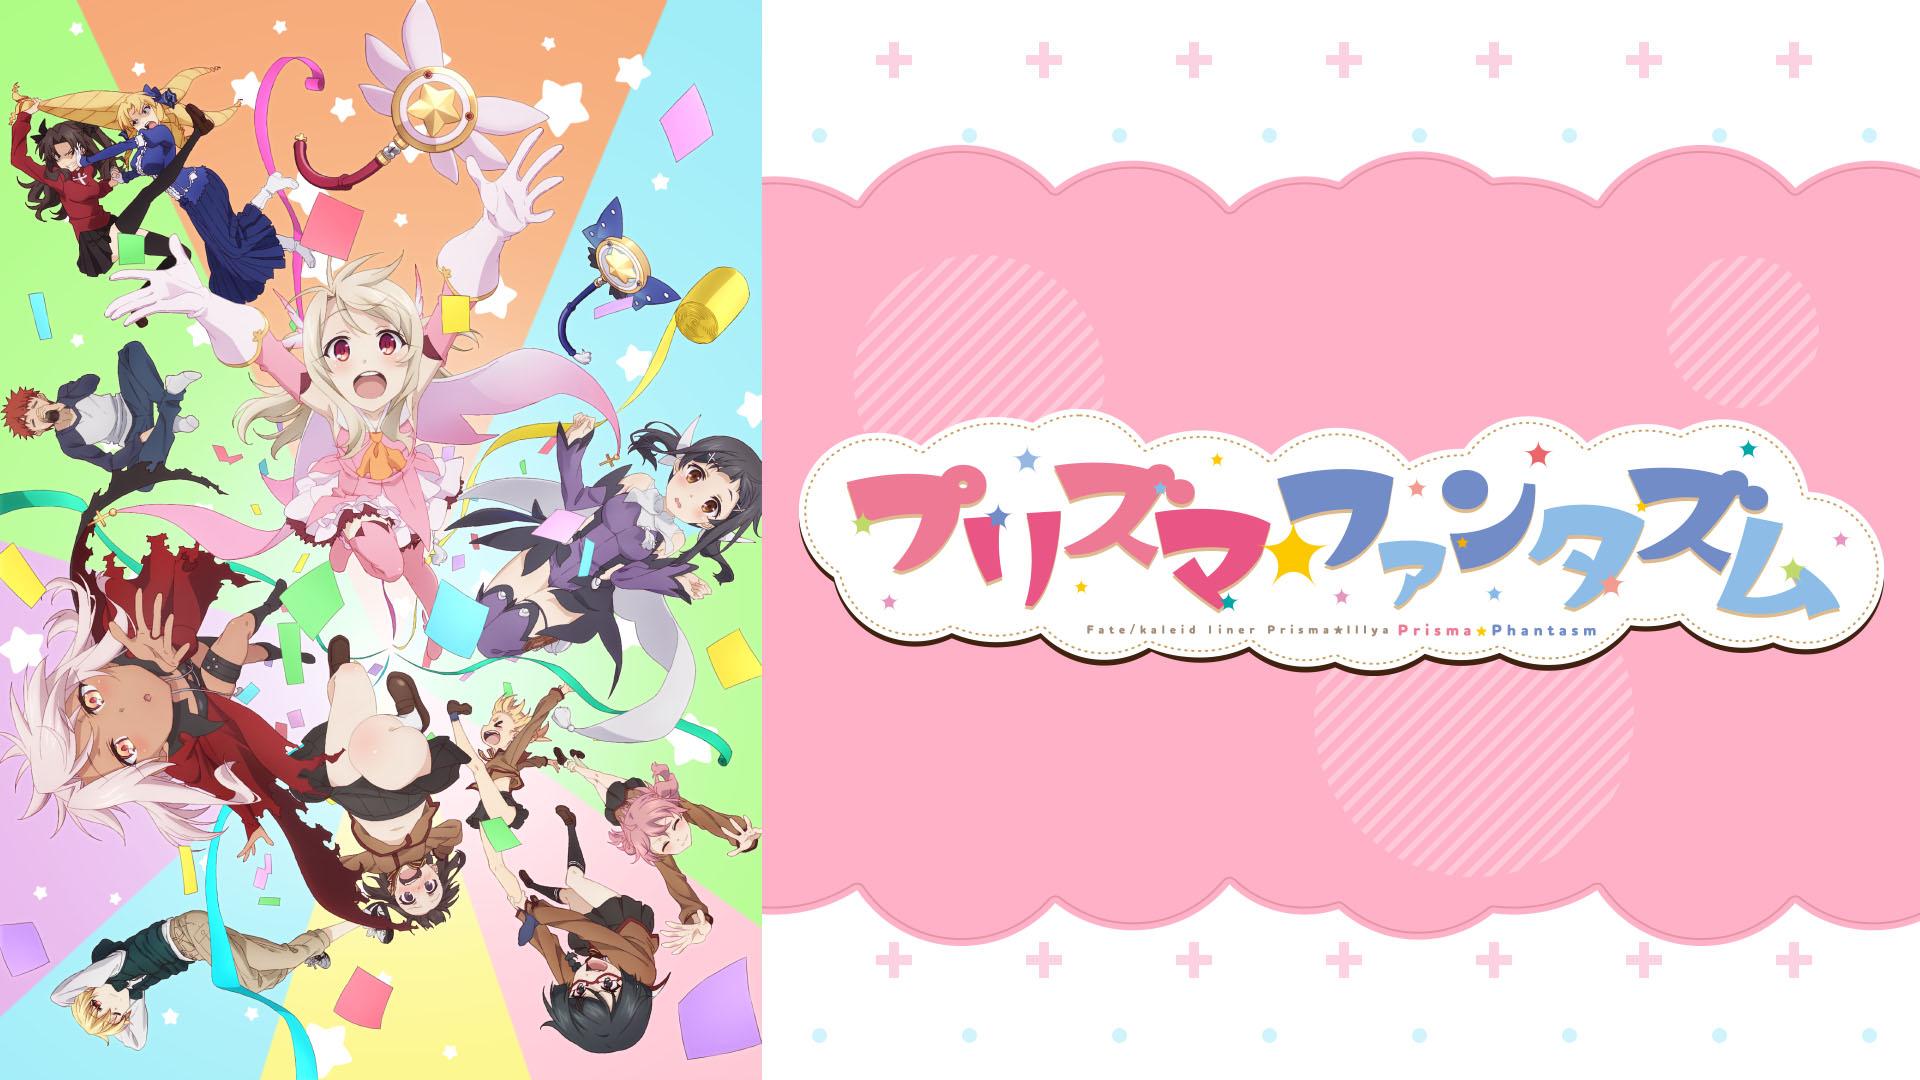 Fate/kaleid liner Prisma☆Illya プリズマ☆ファンタズム(dアニメストア)